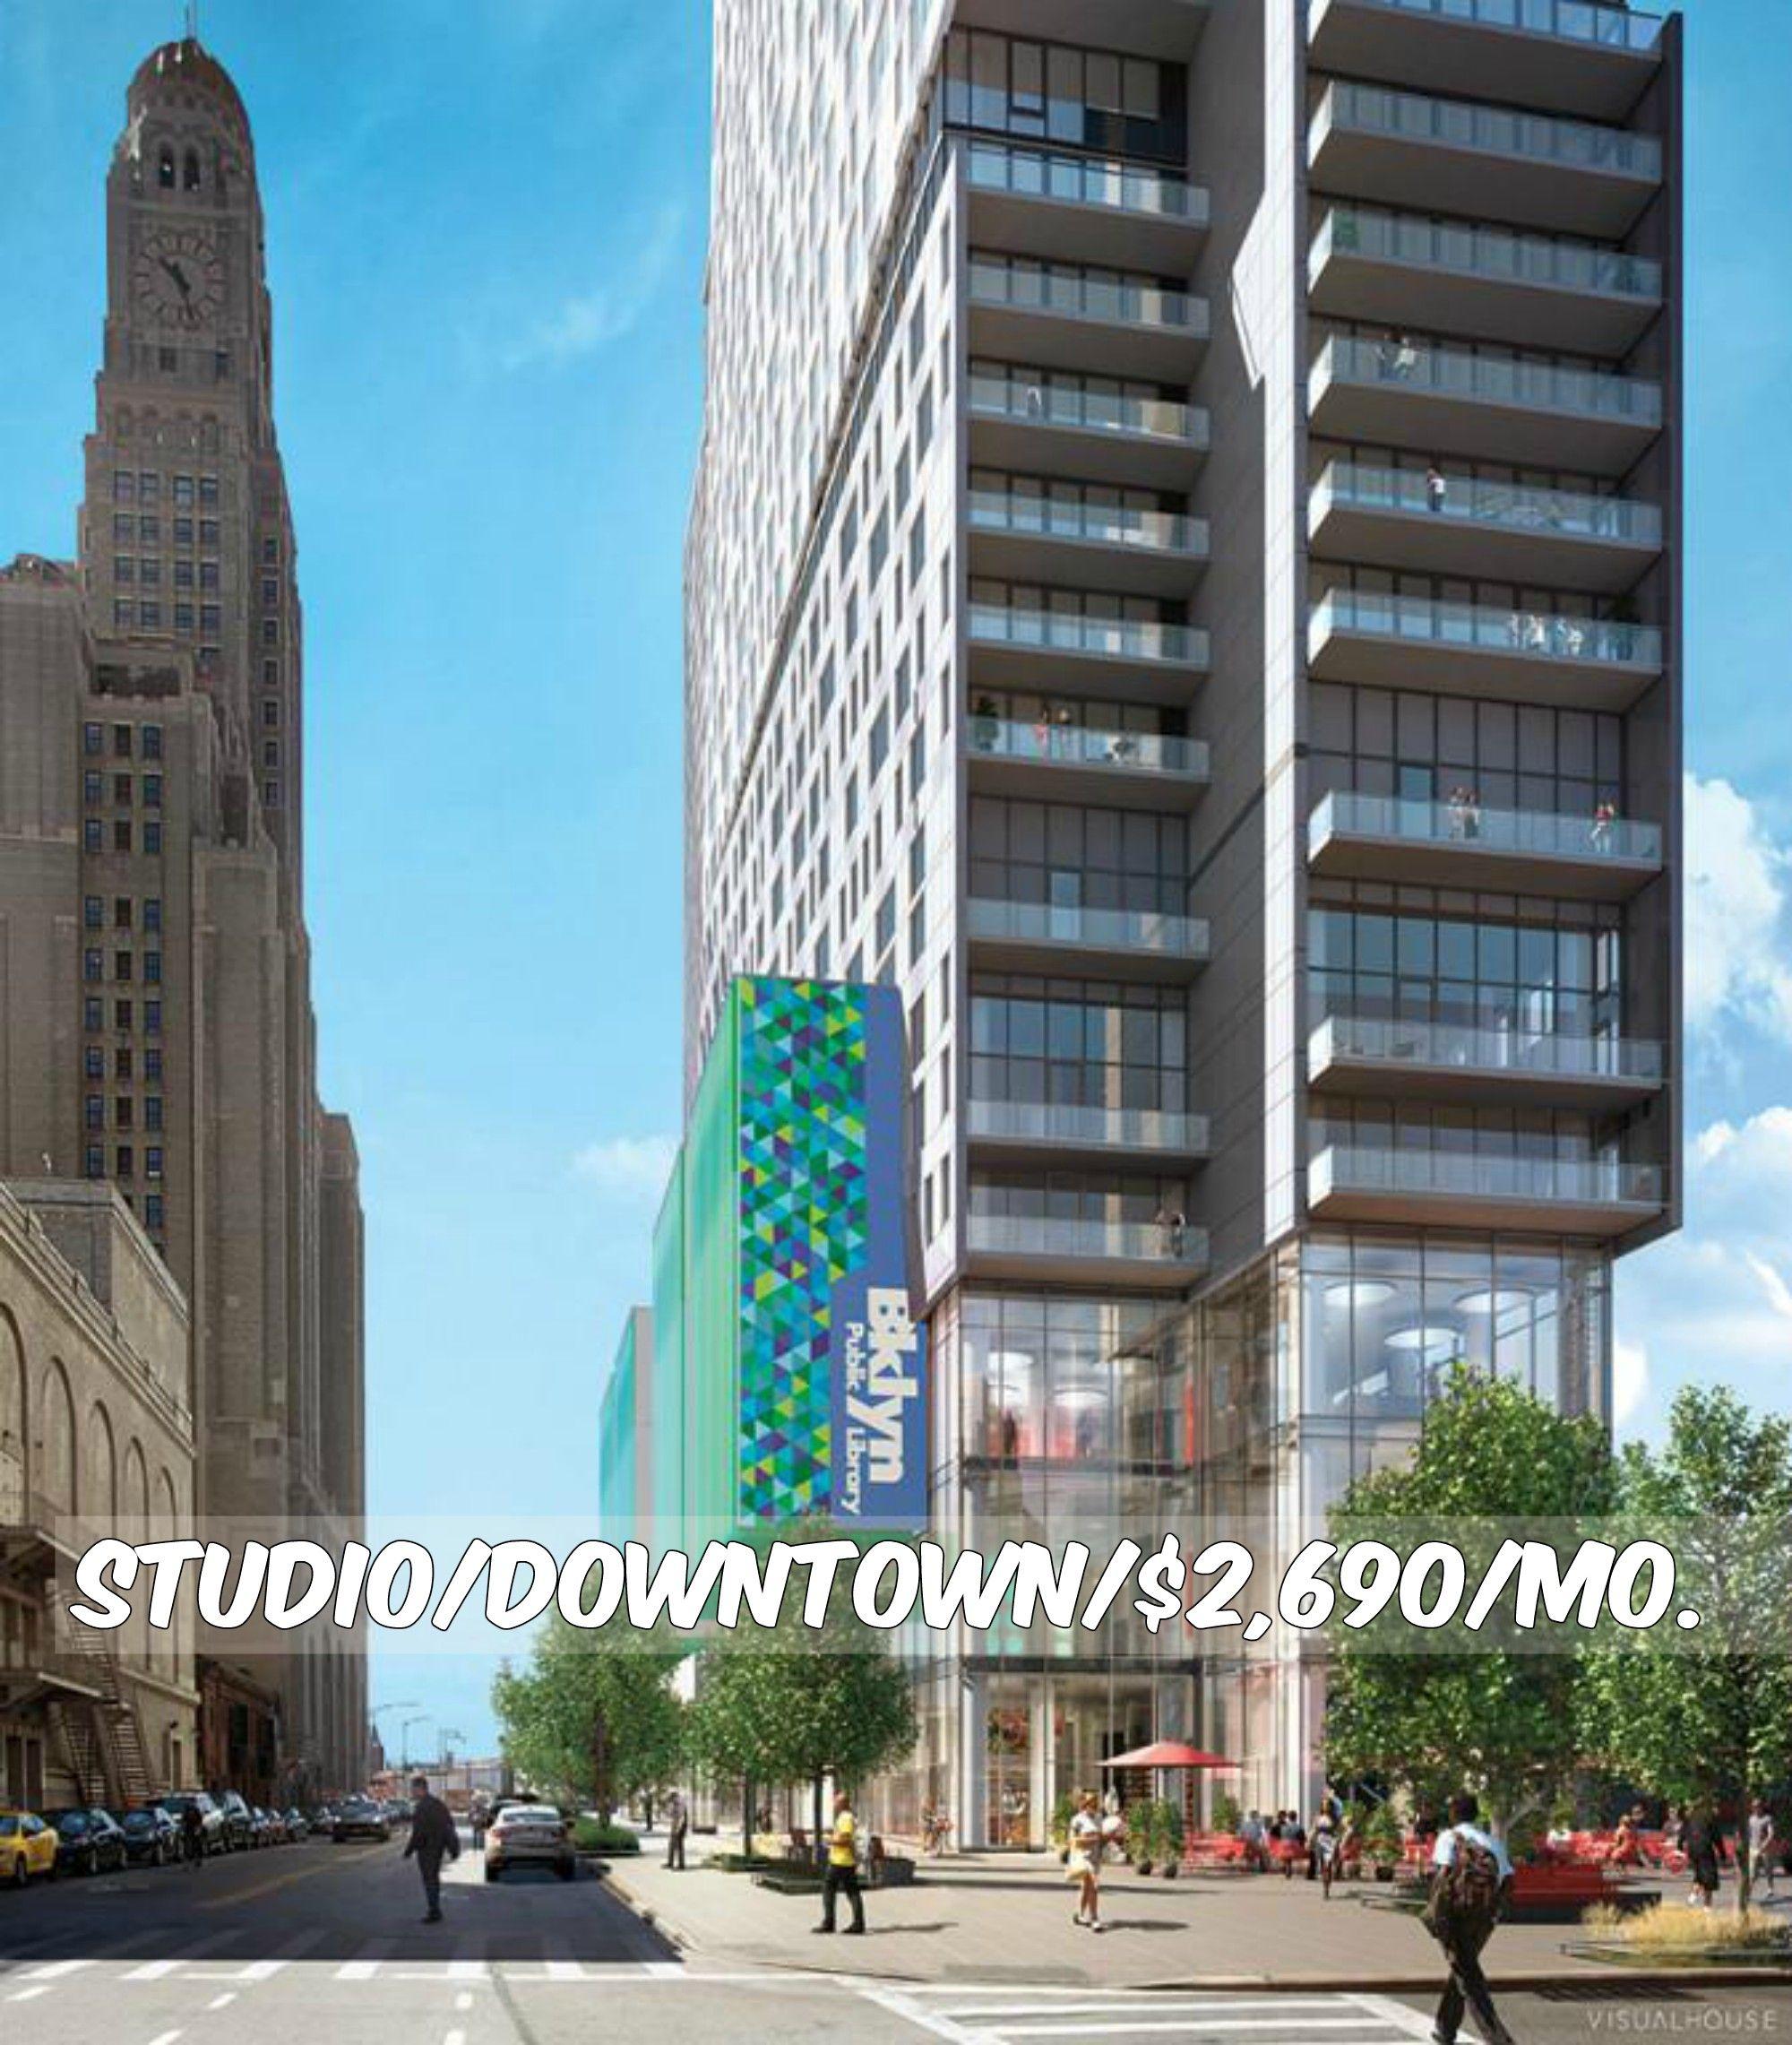 Studio apt for rent in Downtown at 2,690/mo.Doorman